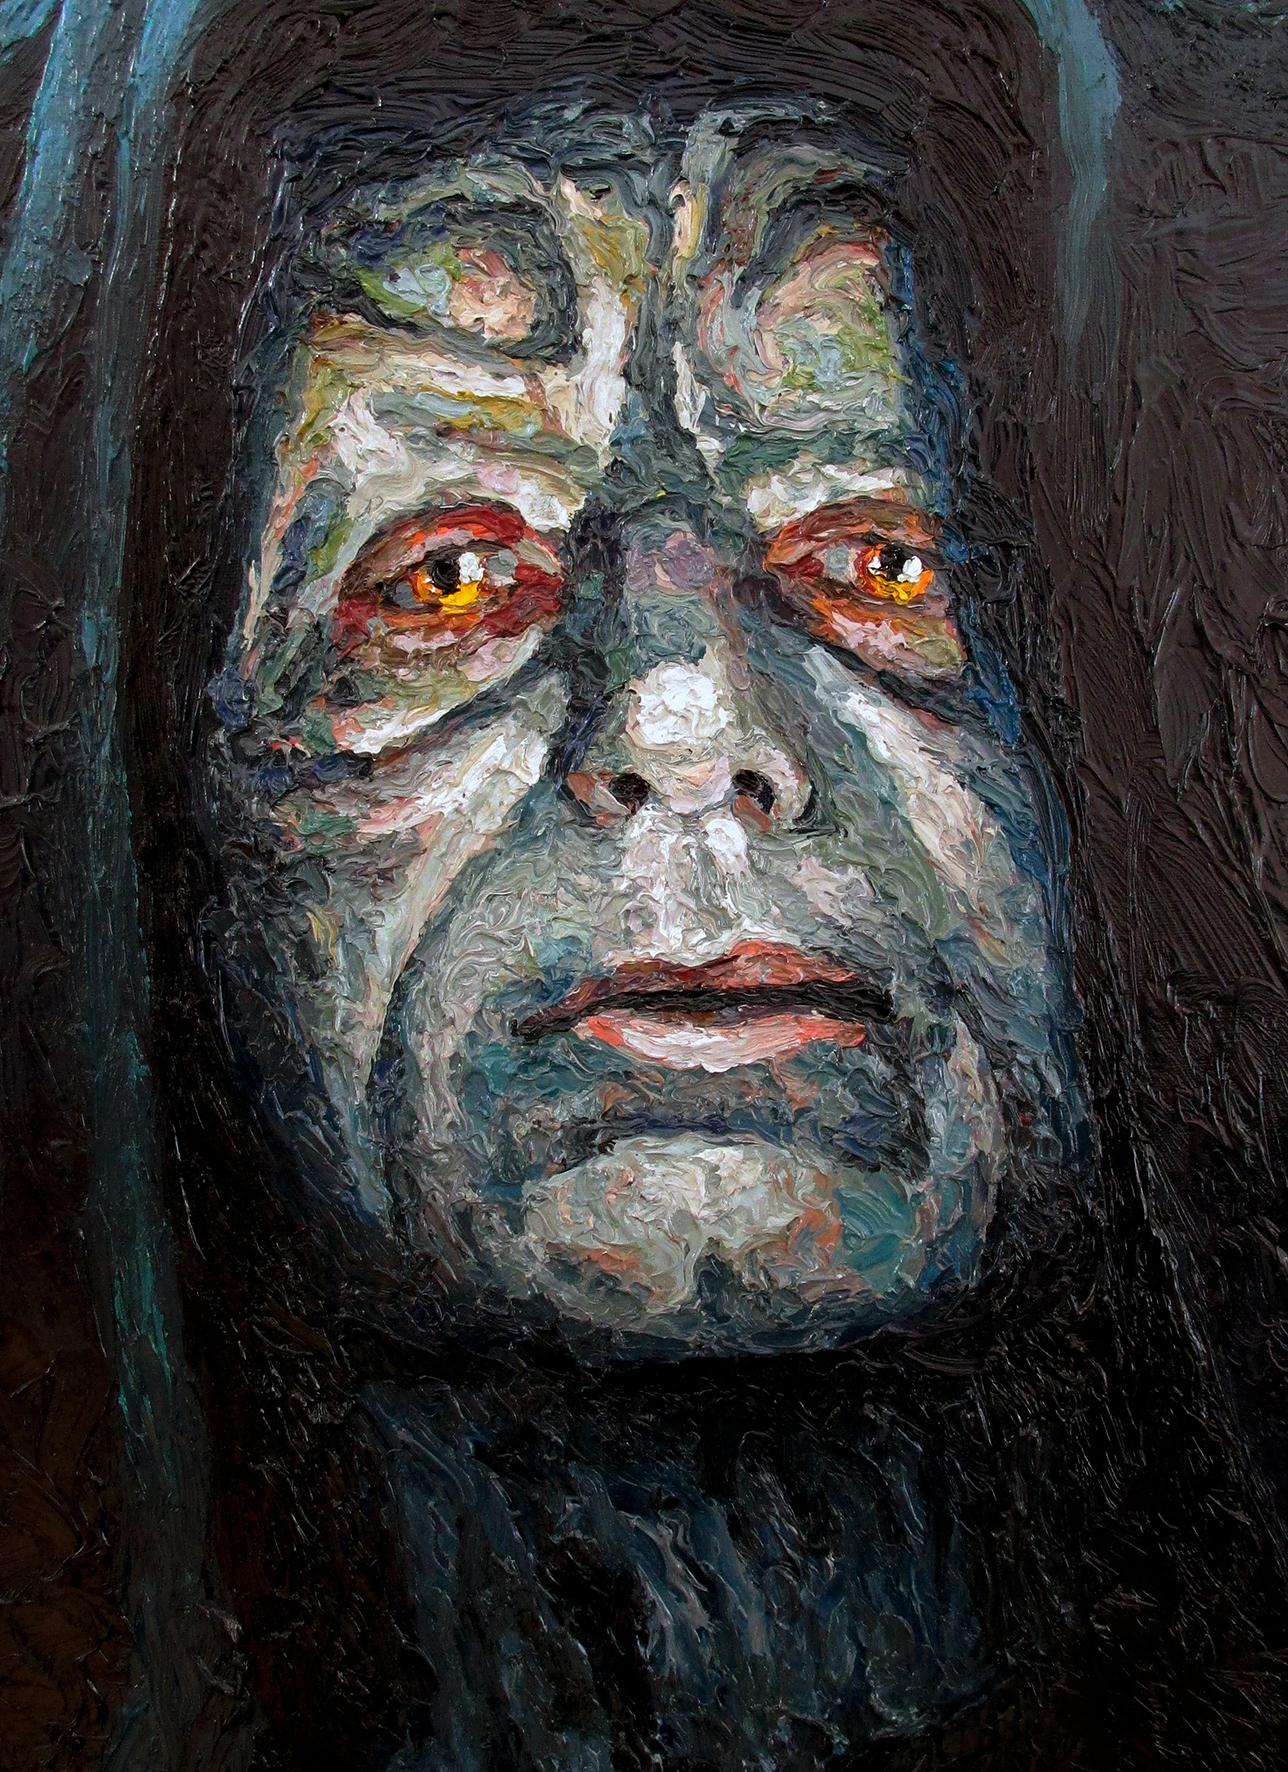 emperor palpatine darth sidious oil painting